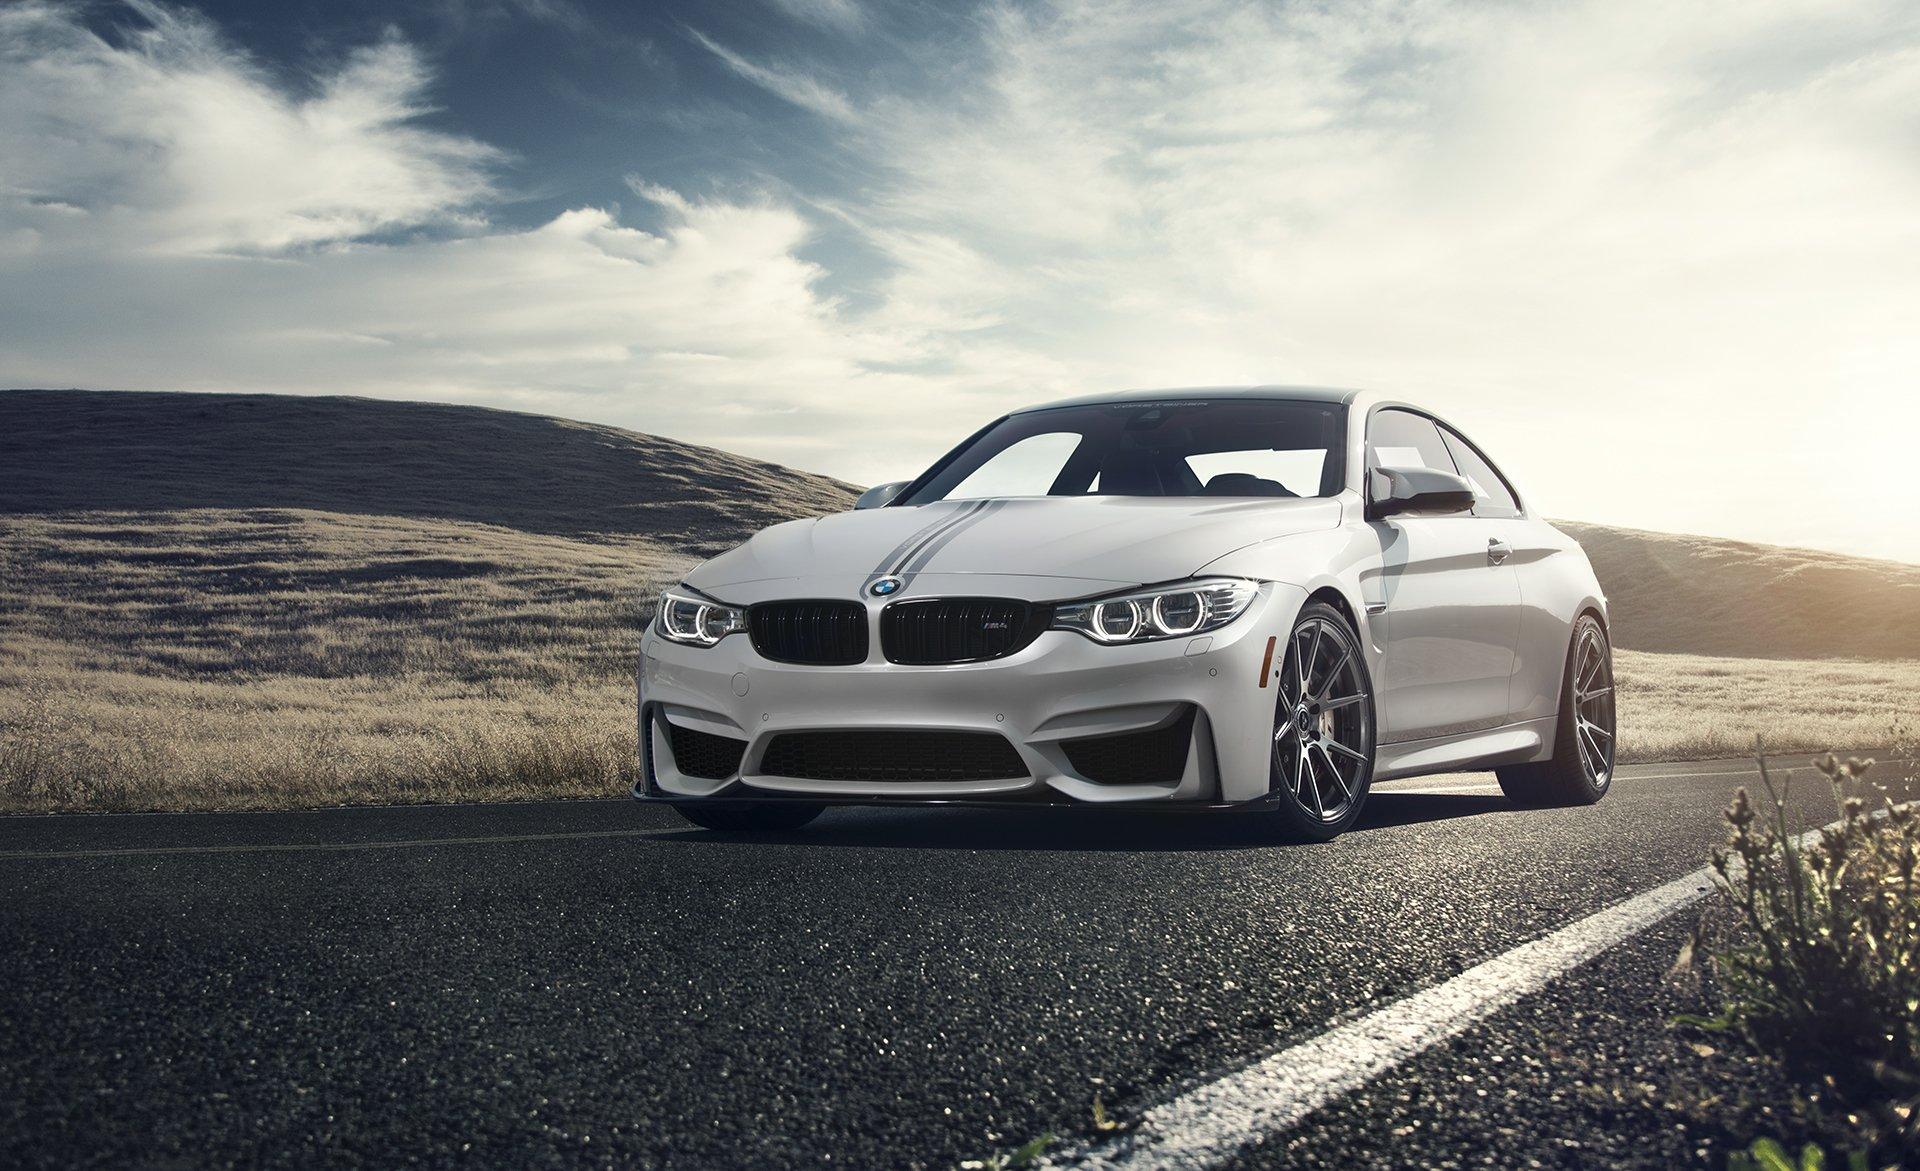 Vehicles - BMW M4  BMW White Car Car Vehicle Wallpaper